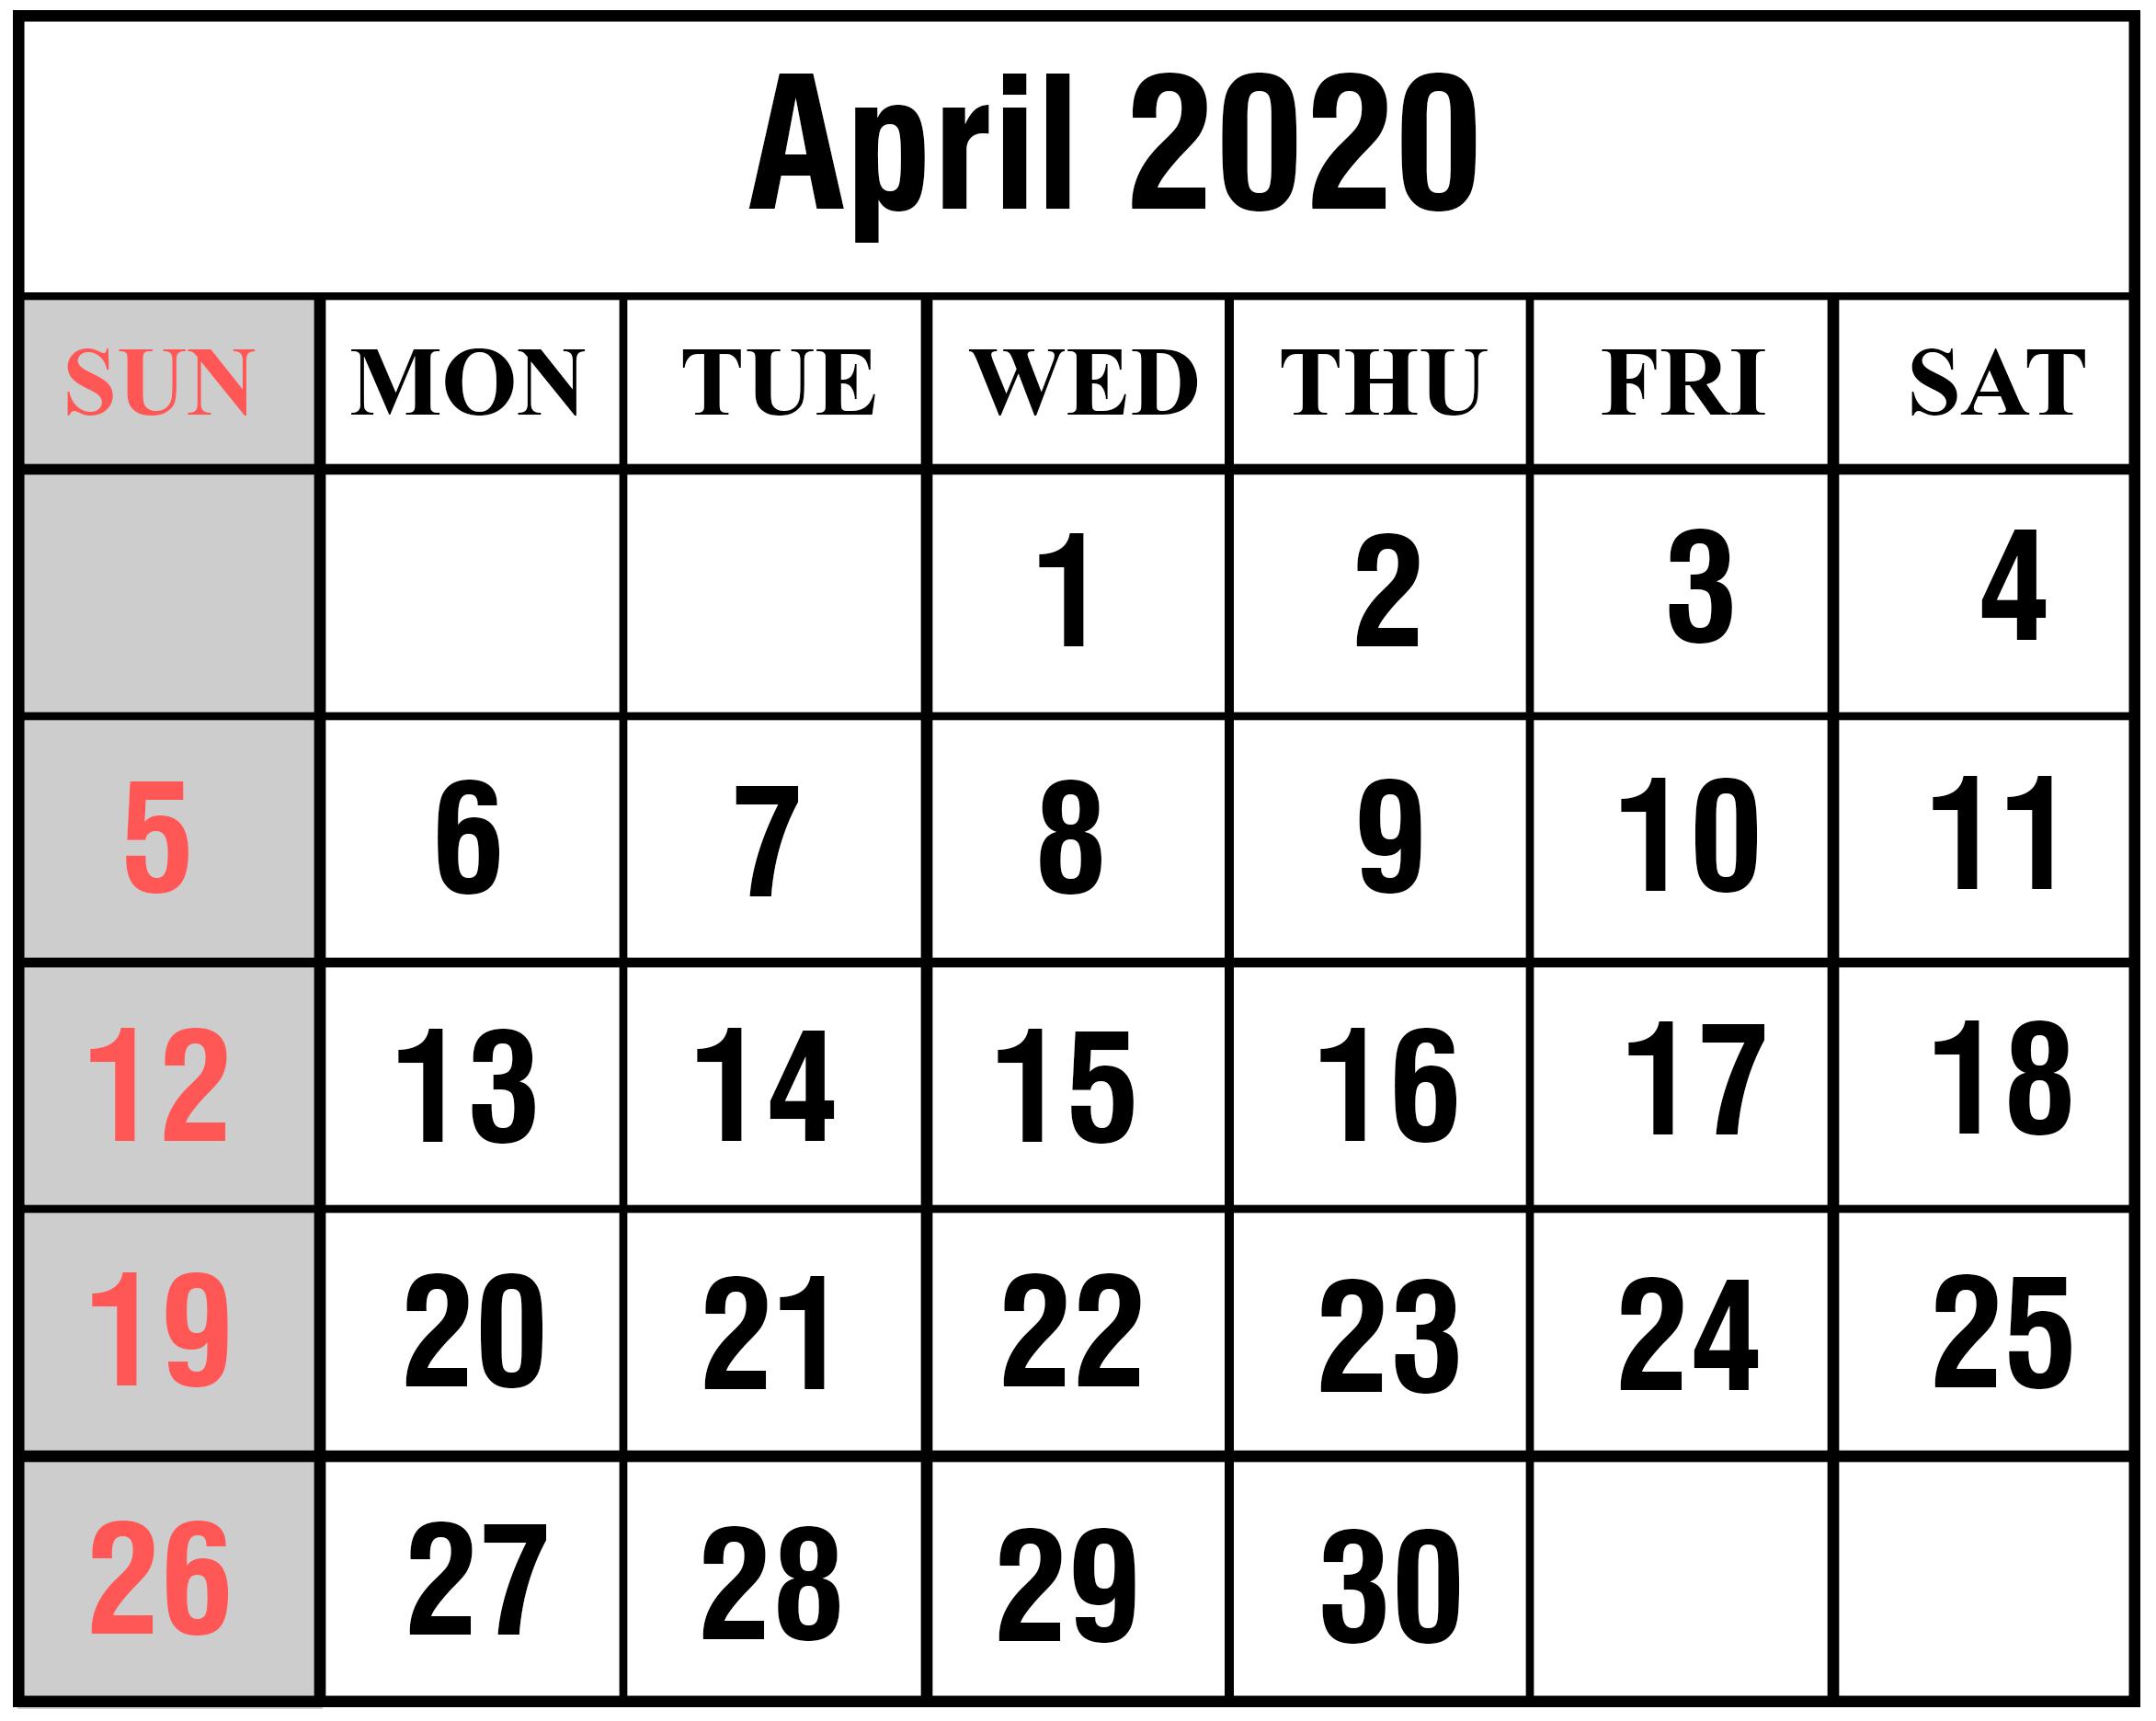 April 2020 Calendar Wallpapers Top Free April 2020 Calendar